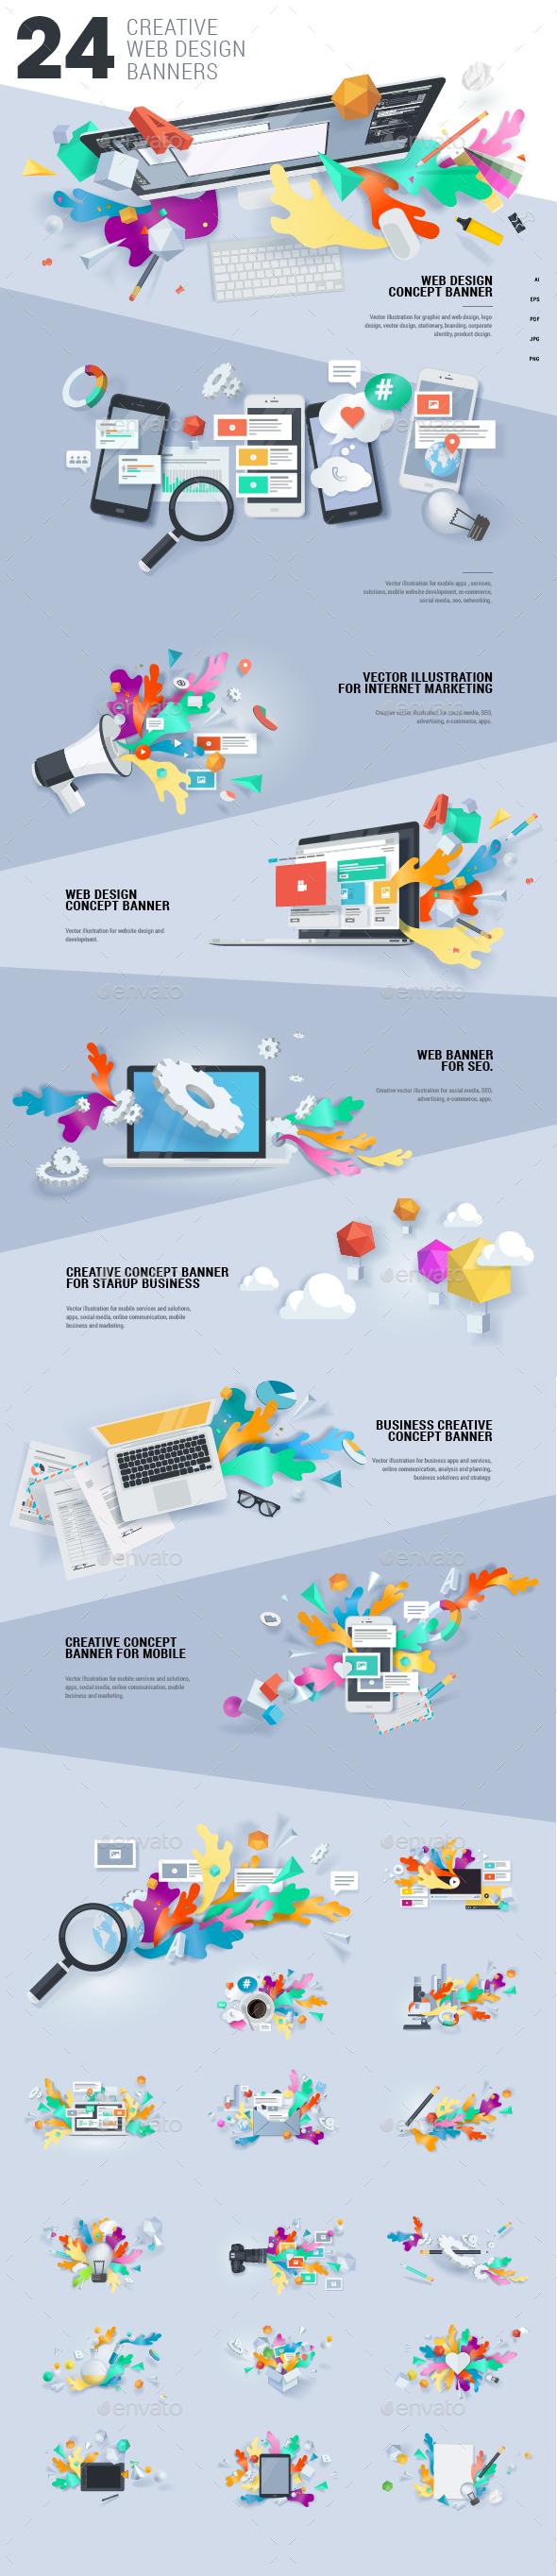 Creative Concept Banners - Web Elements Vectors